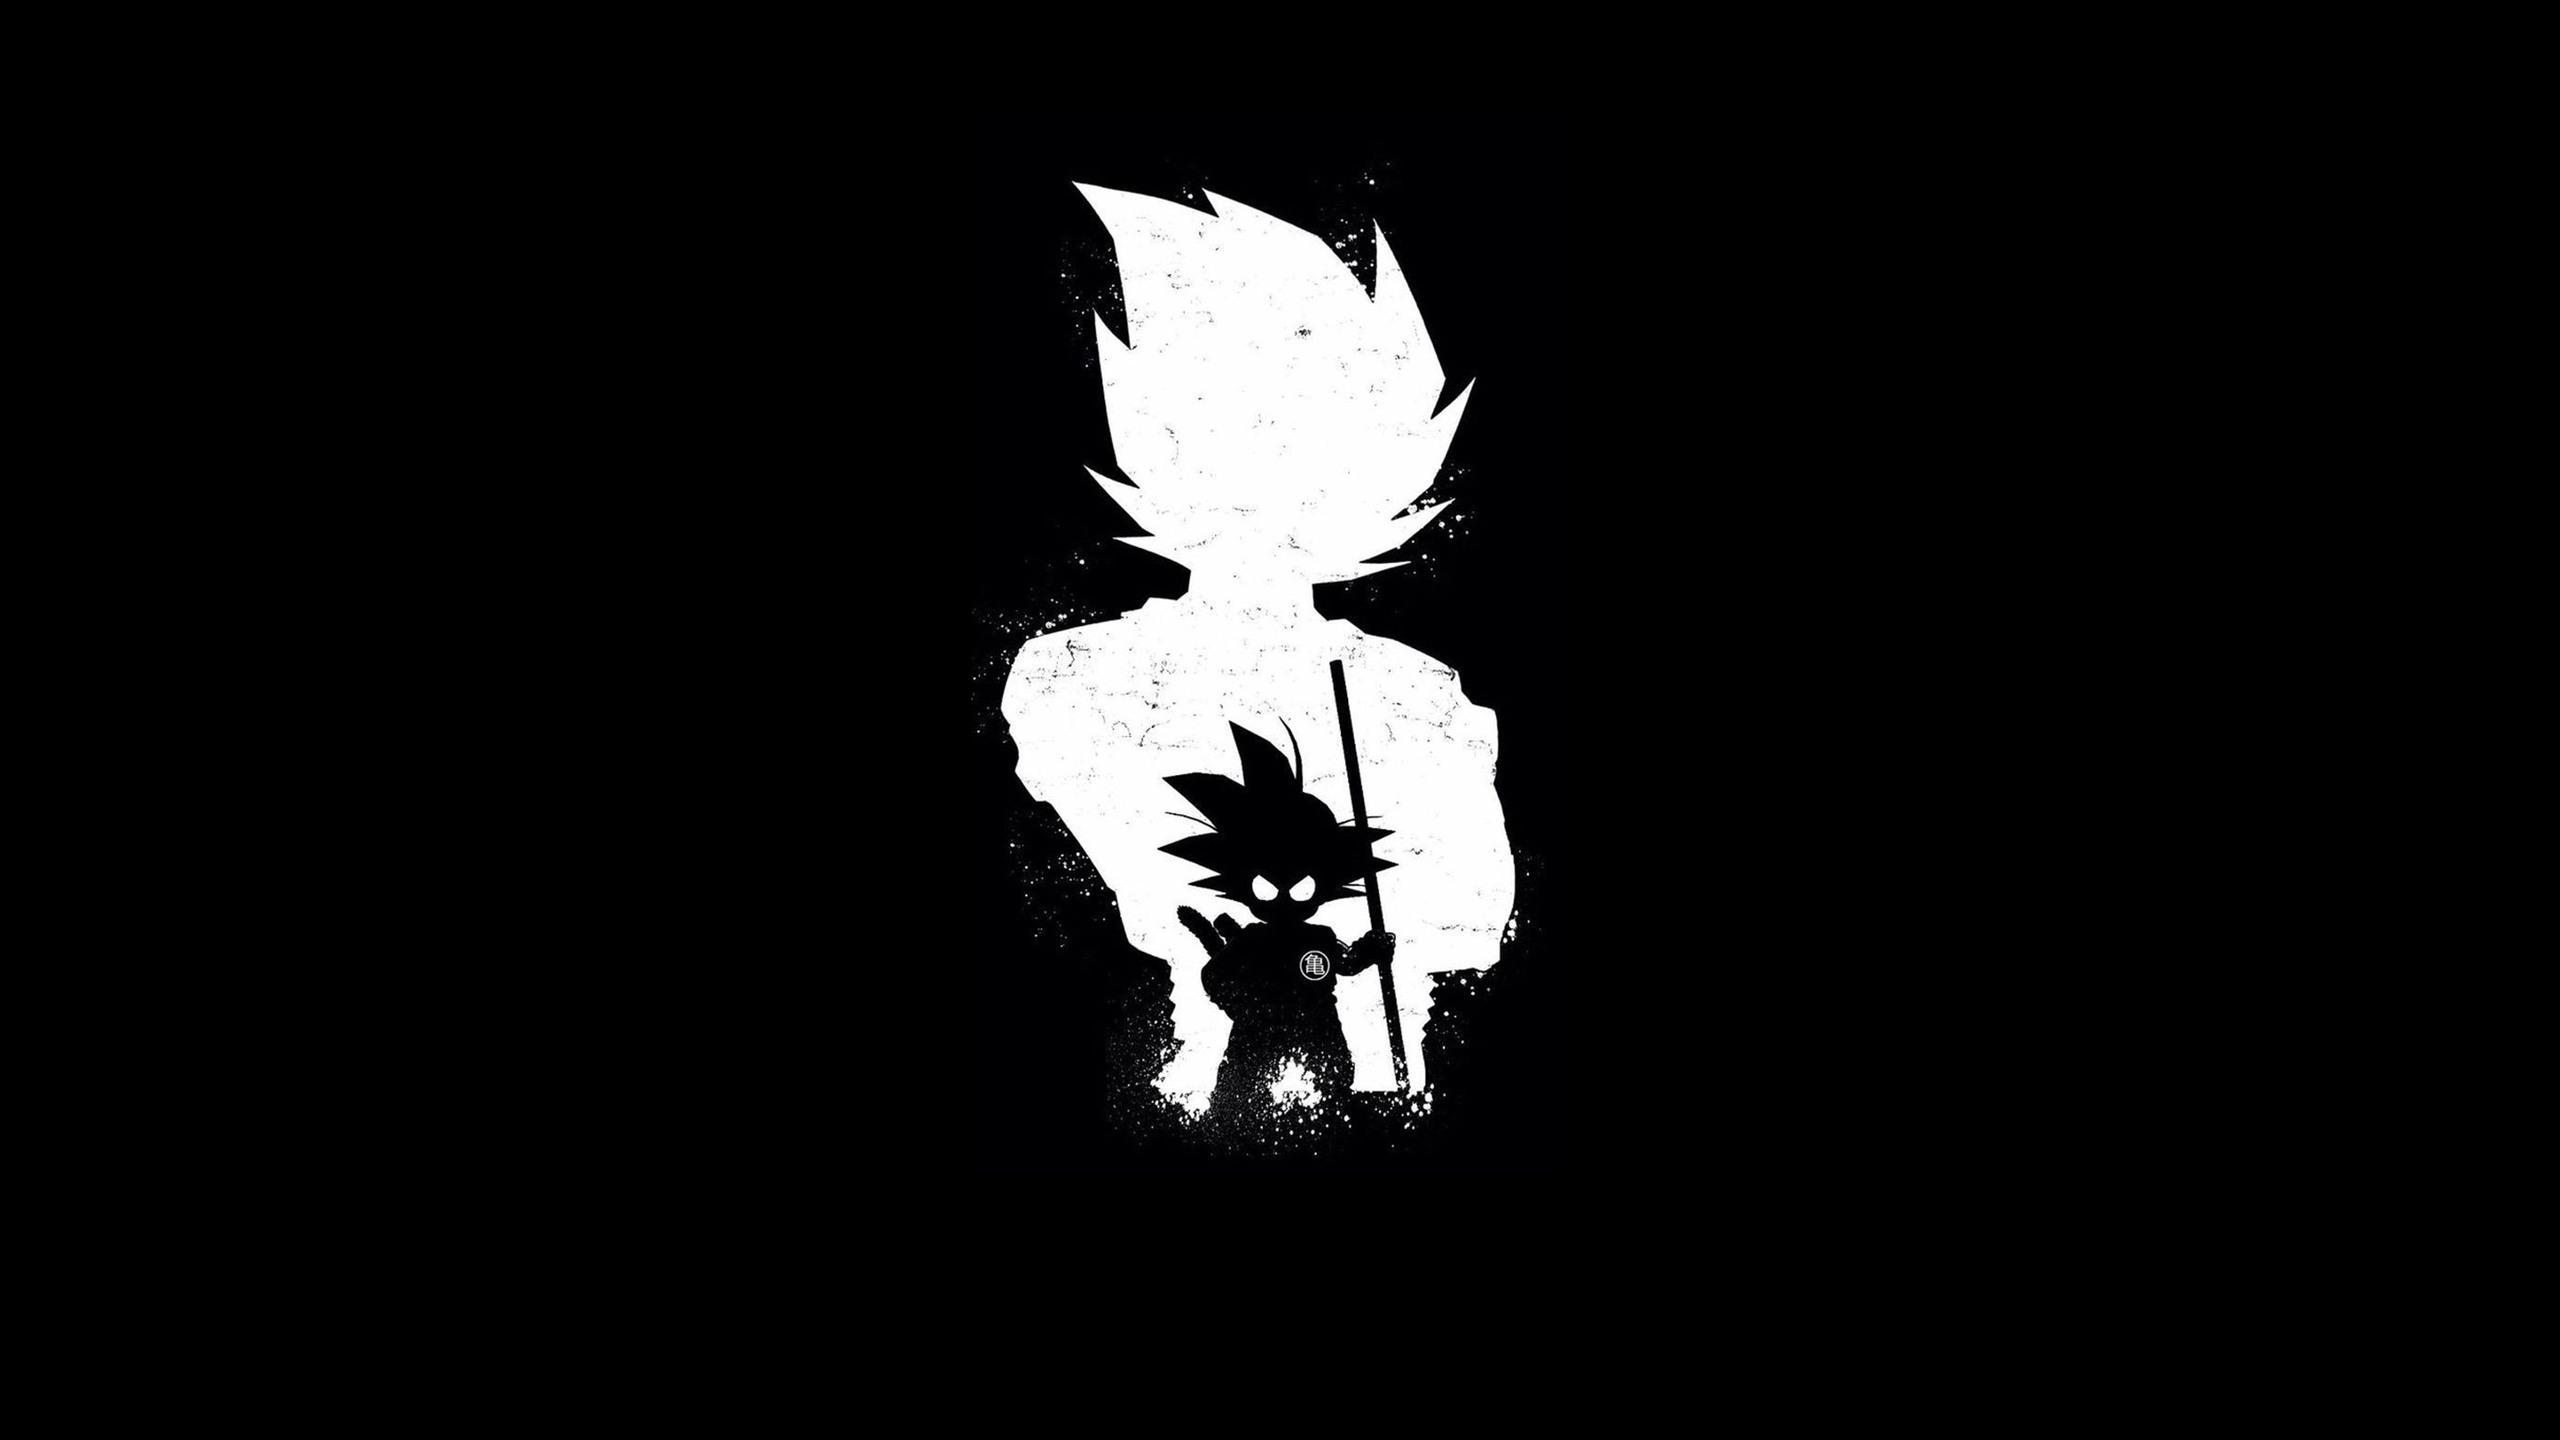 2560x1440 Goku Anime Dark Black 4k 1440p Resolution Hd 4k